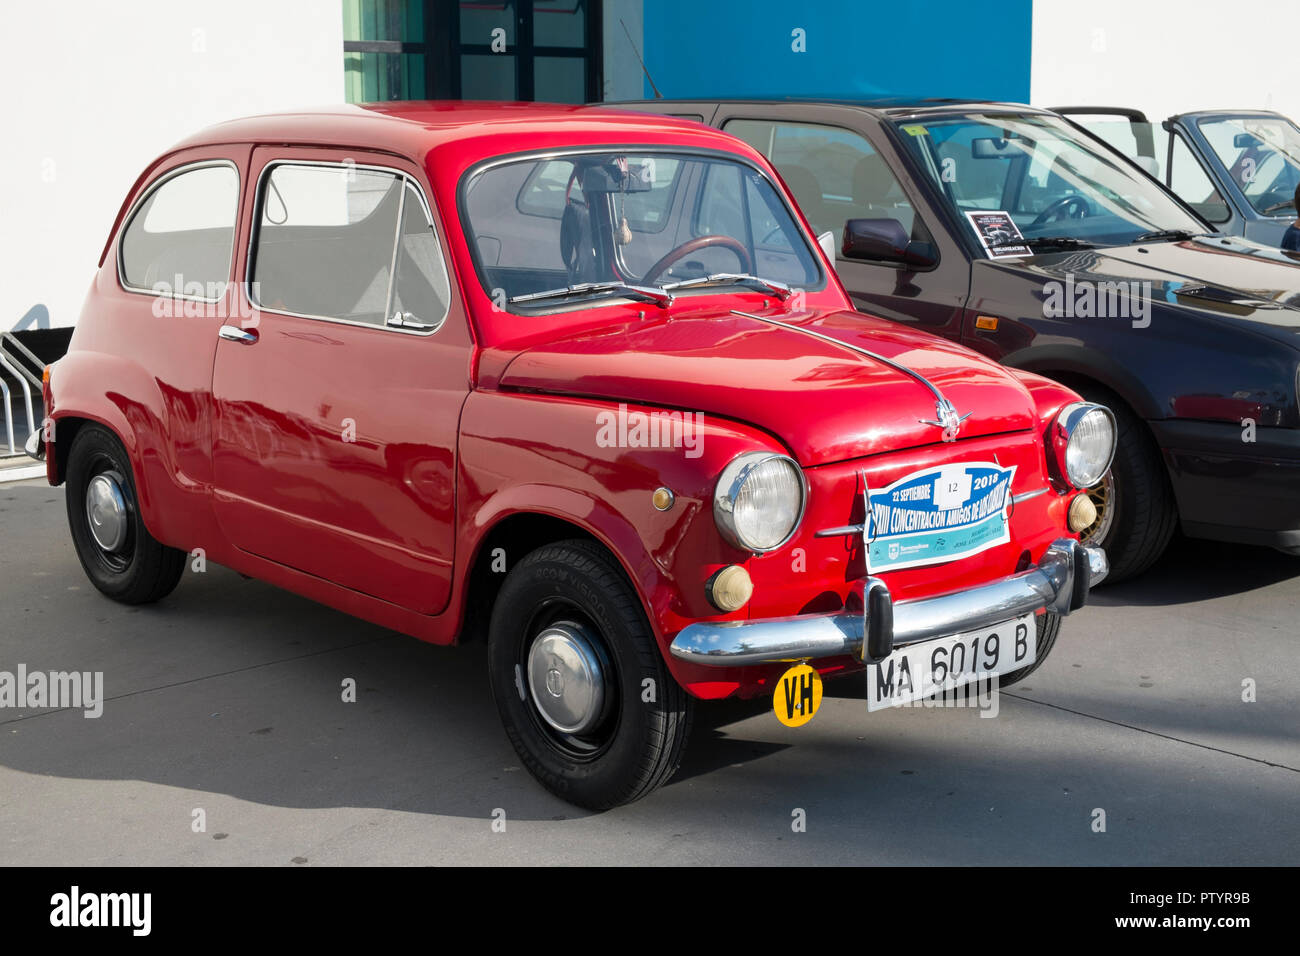 1972 Seat 600. Classic car meeting in Torremolinos, Málaga, Spain. - Stock Image